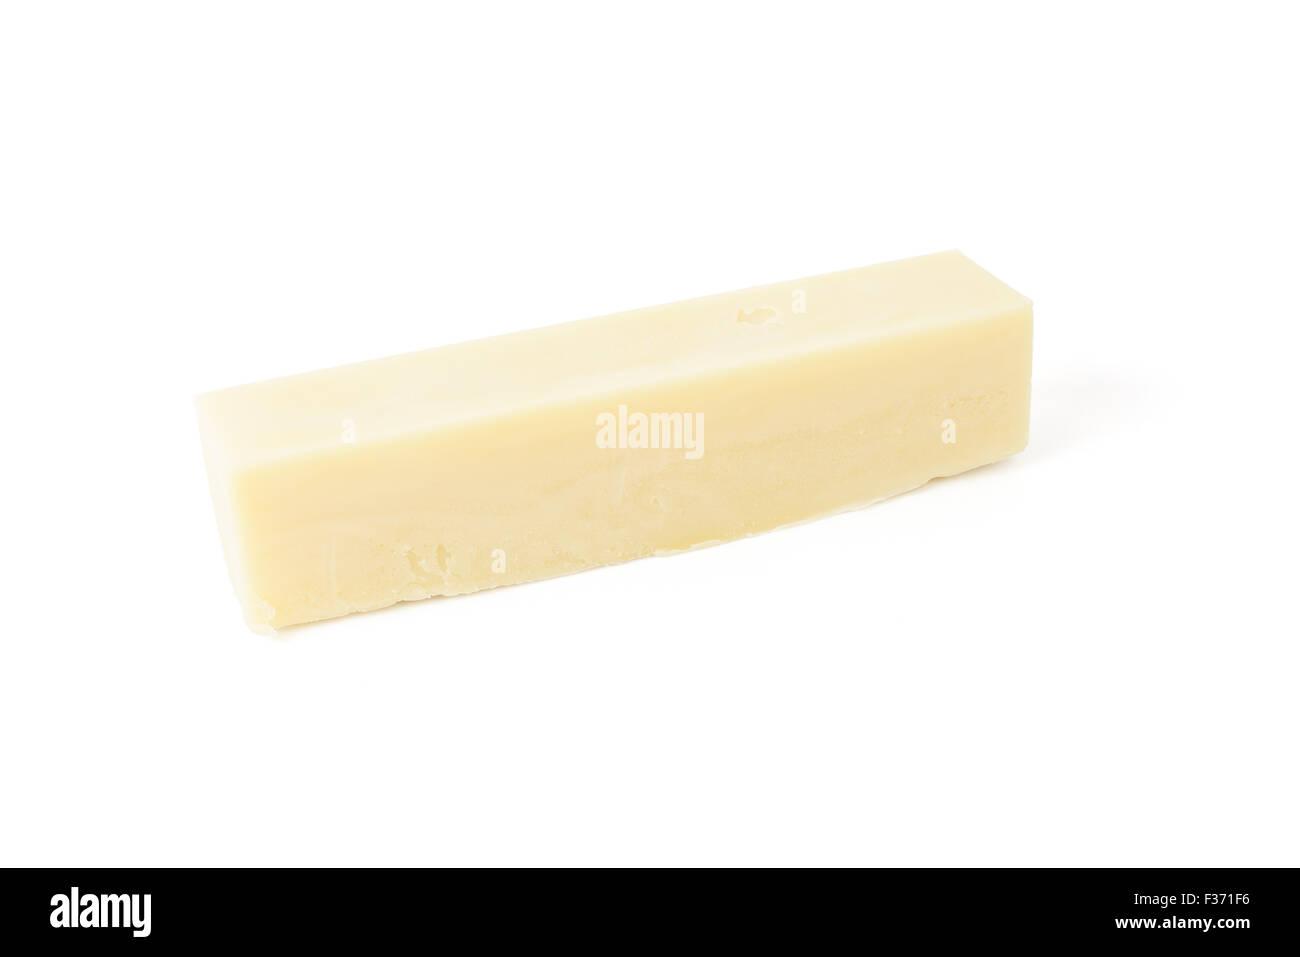 homemade soap bar made from natural materials - Stock Image